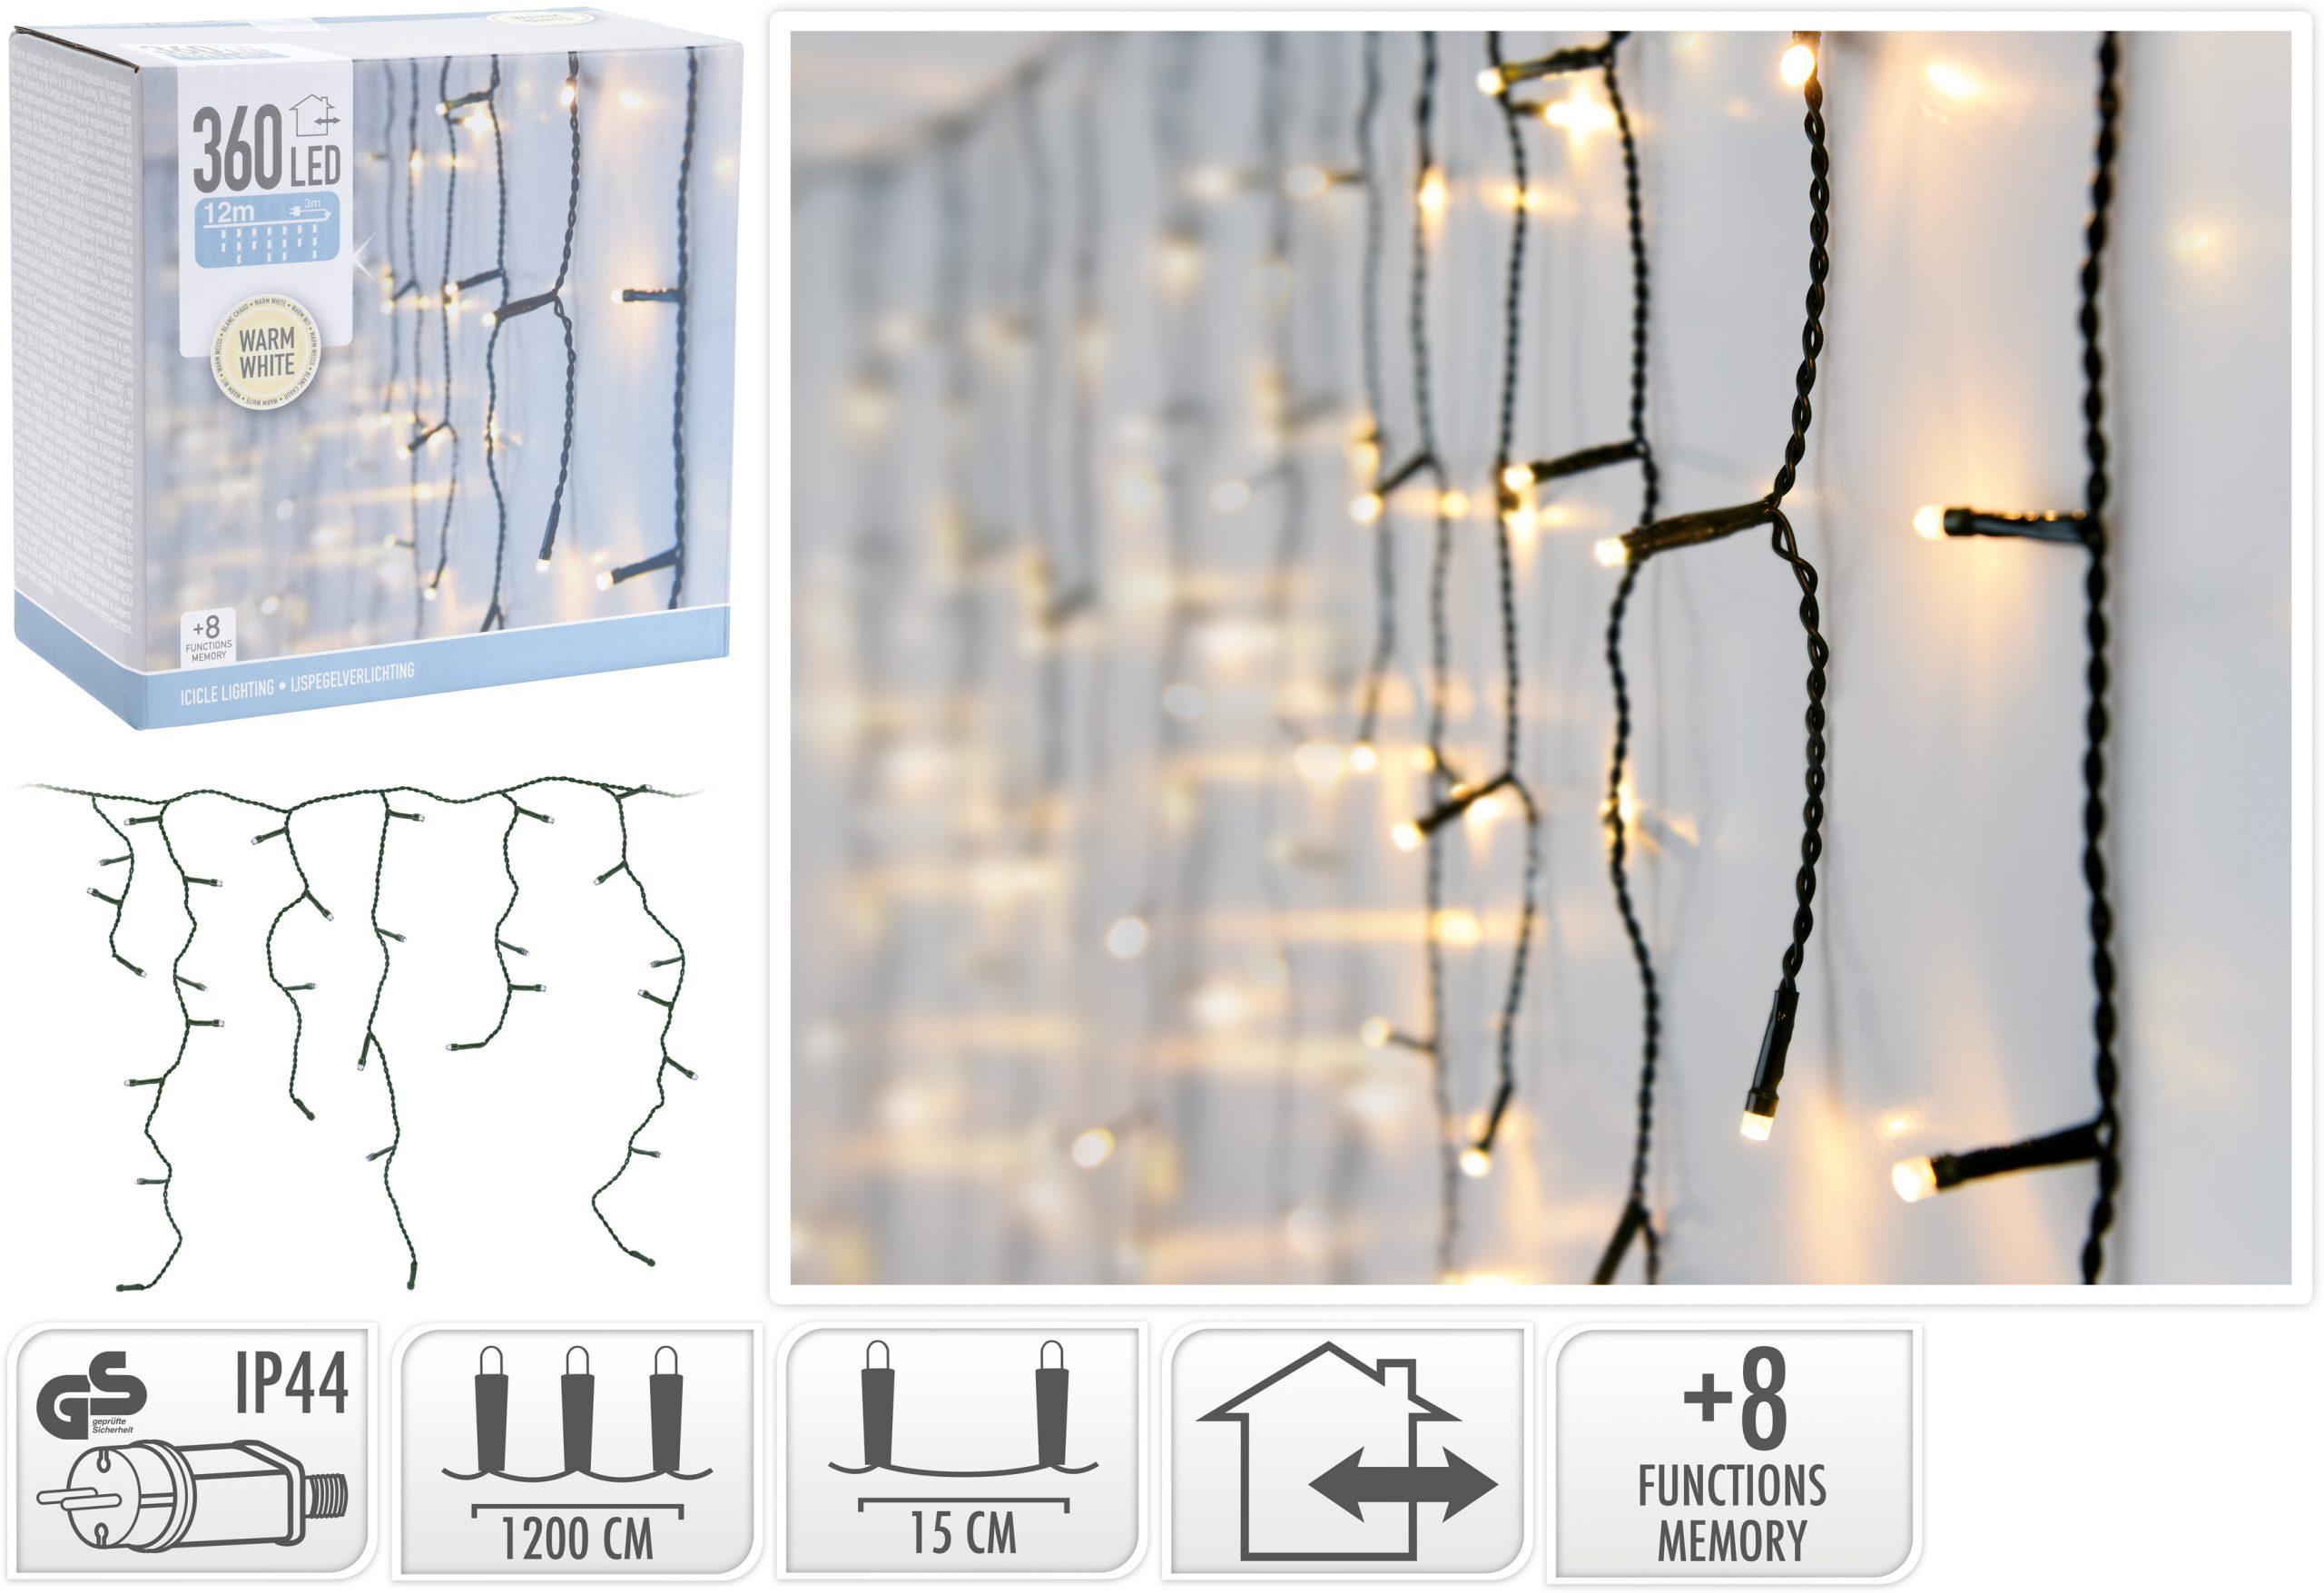 Lichtervorhang warmweiß 360 LED, 12 m Image